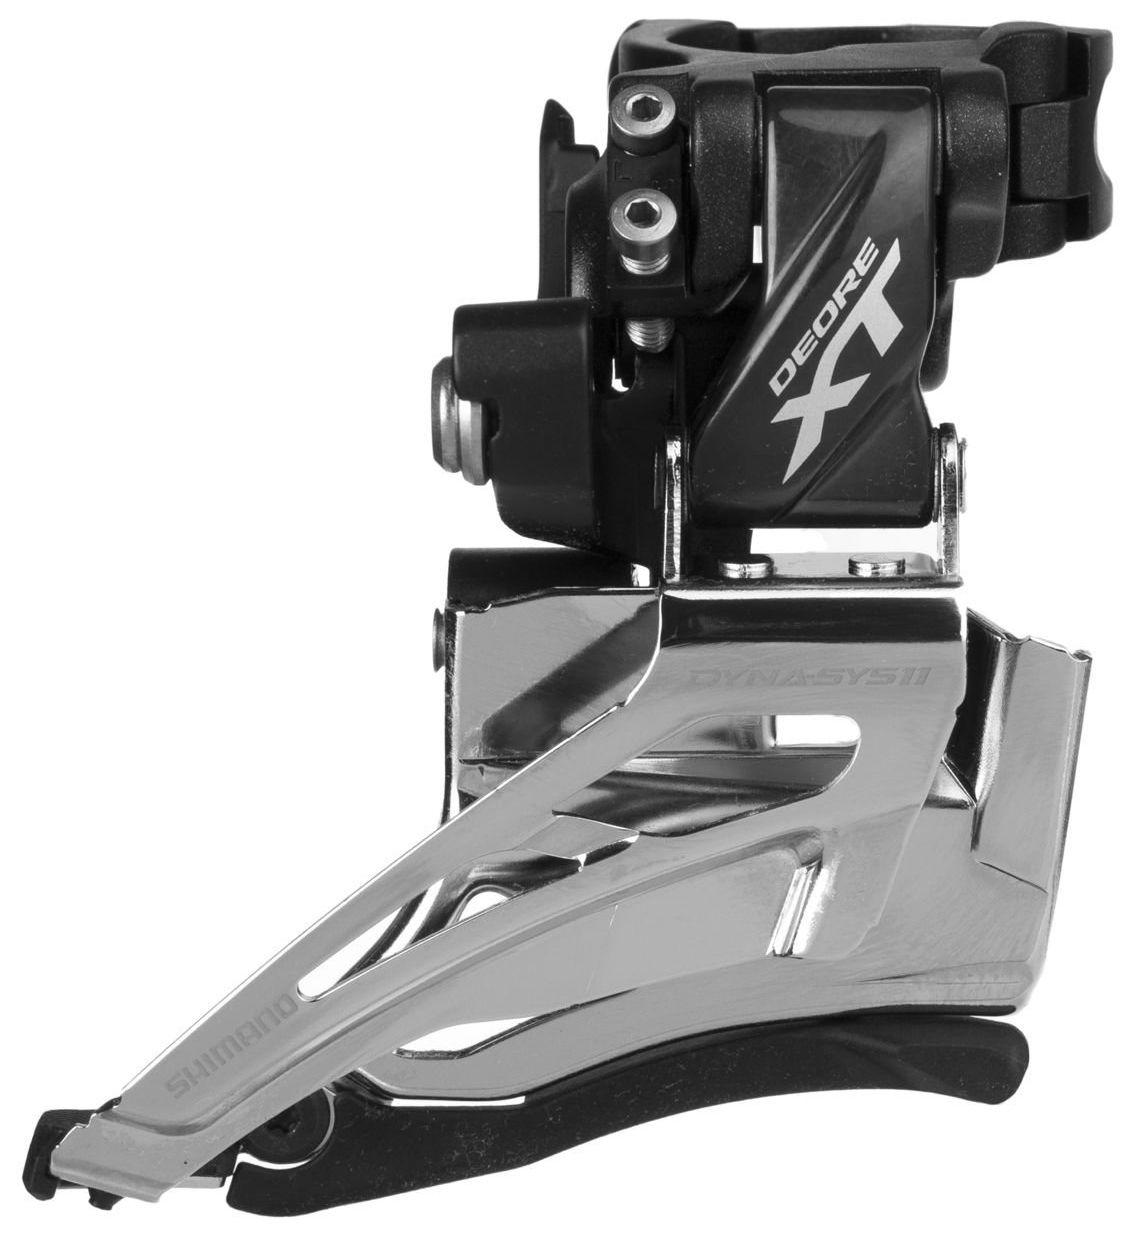 Запчасть Shimano XT M8025-H, для 2x11 (IFDM8025HX6) запчасть shimano xt t780